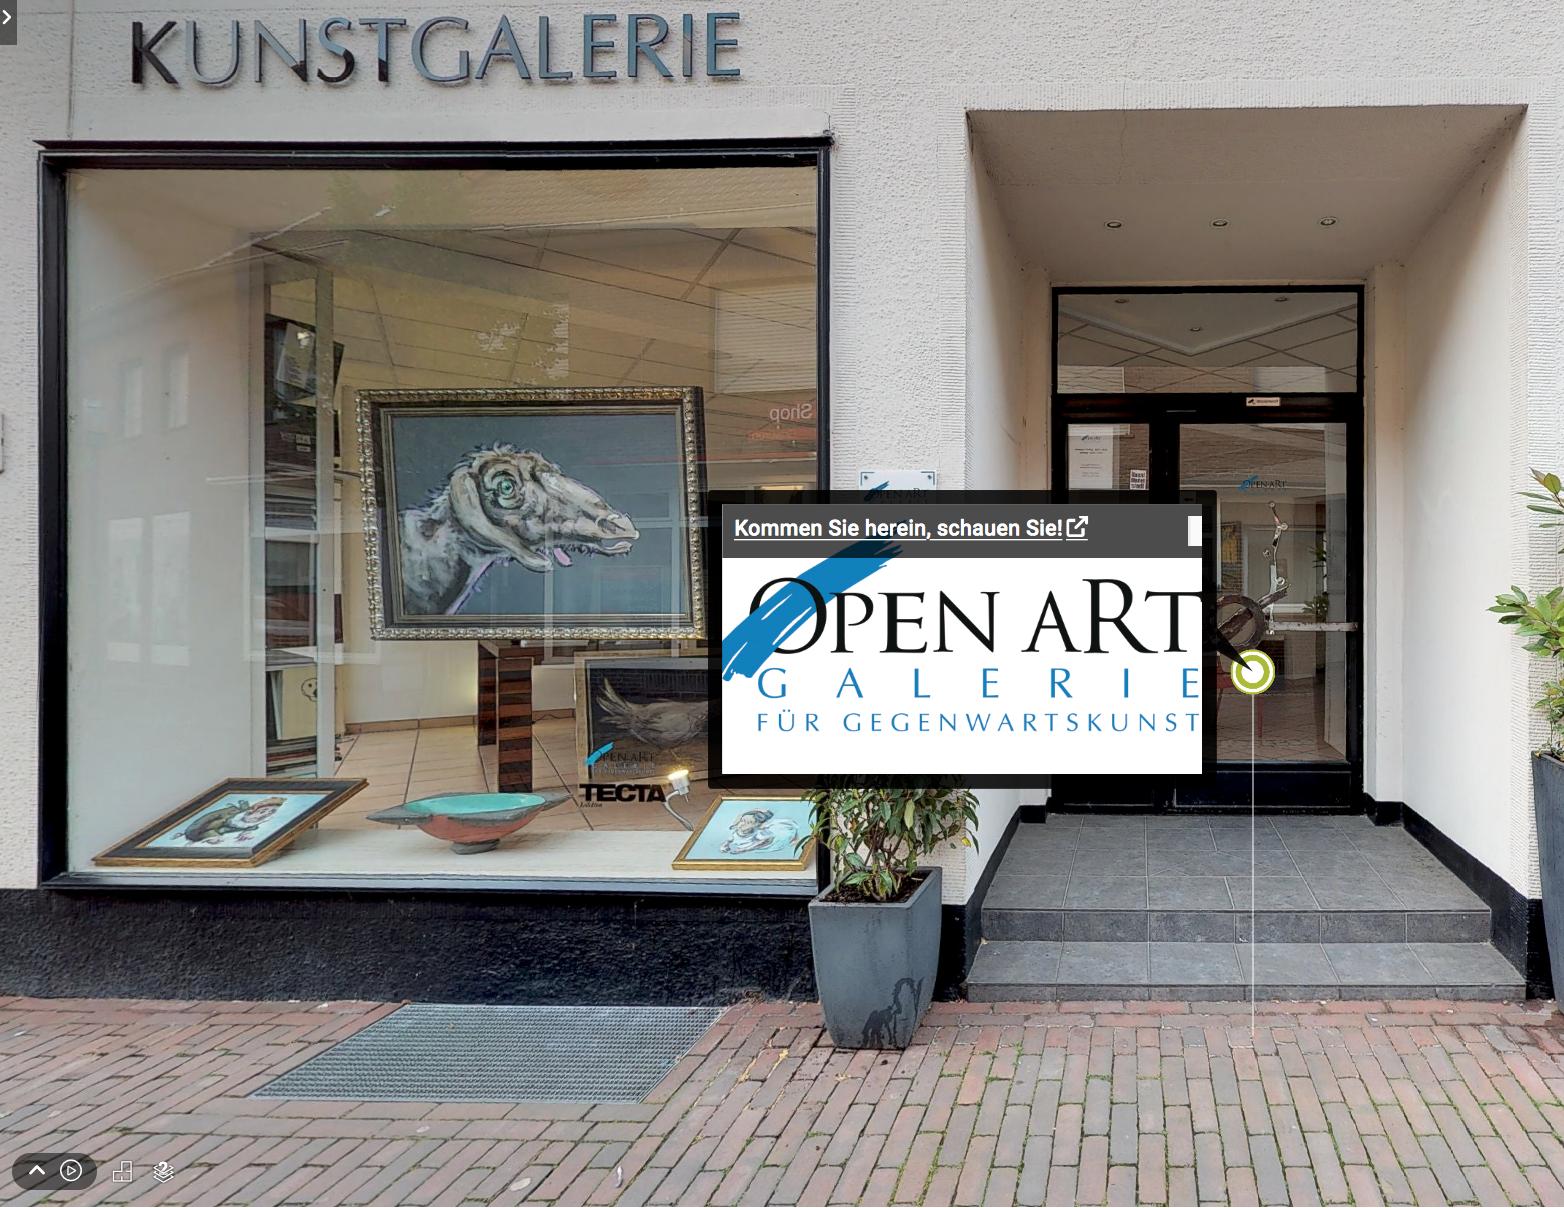 Enter to OpenArt Gallery